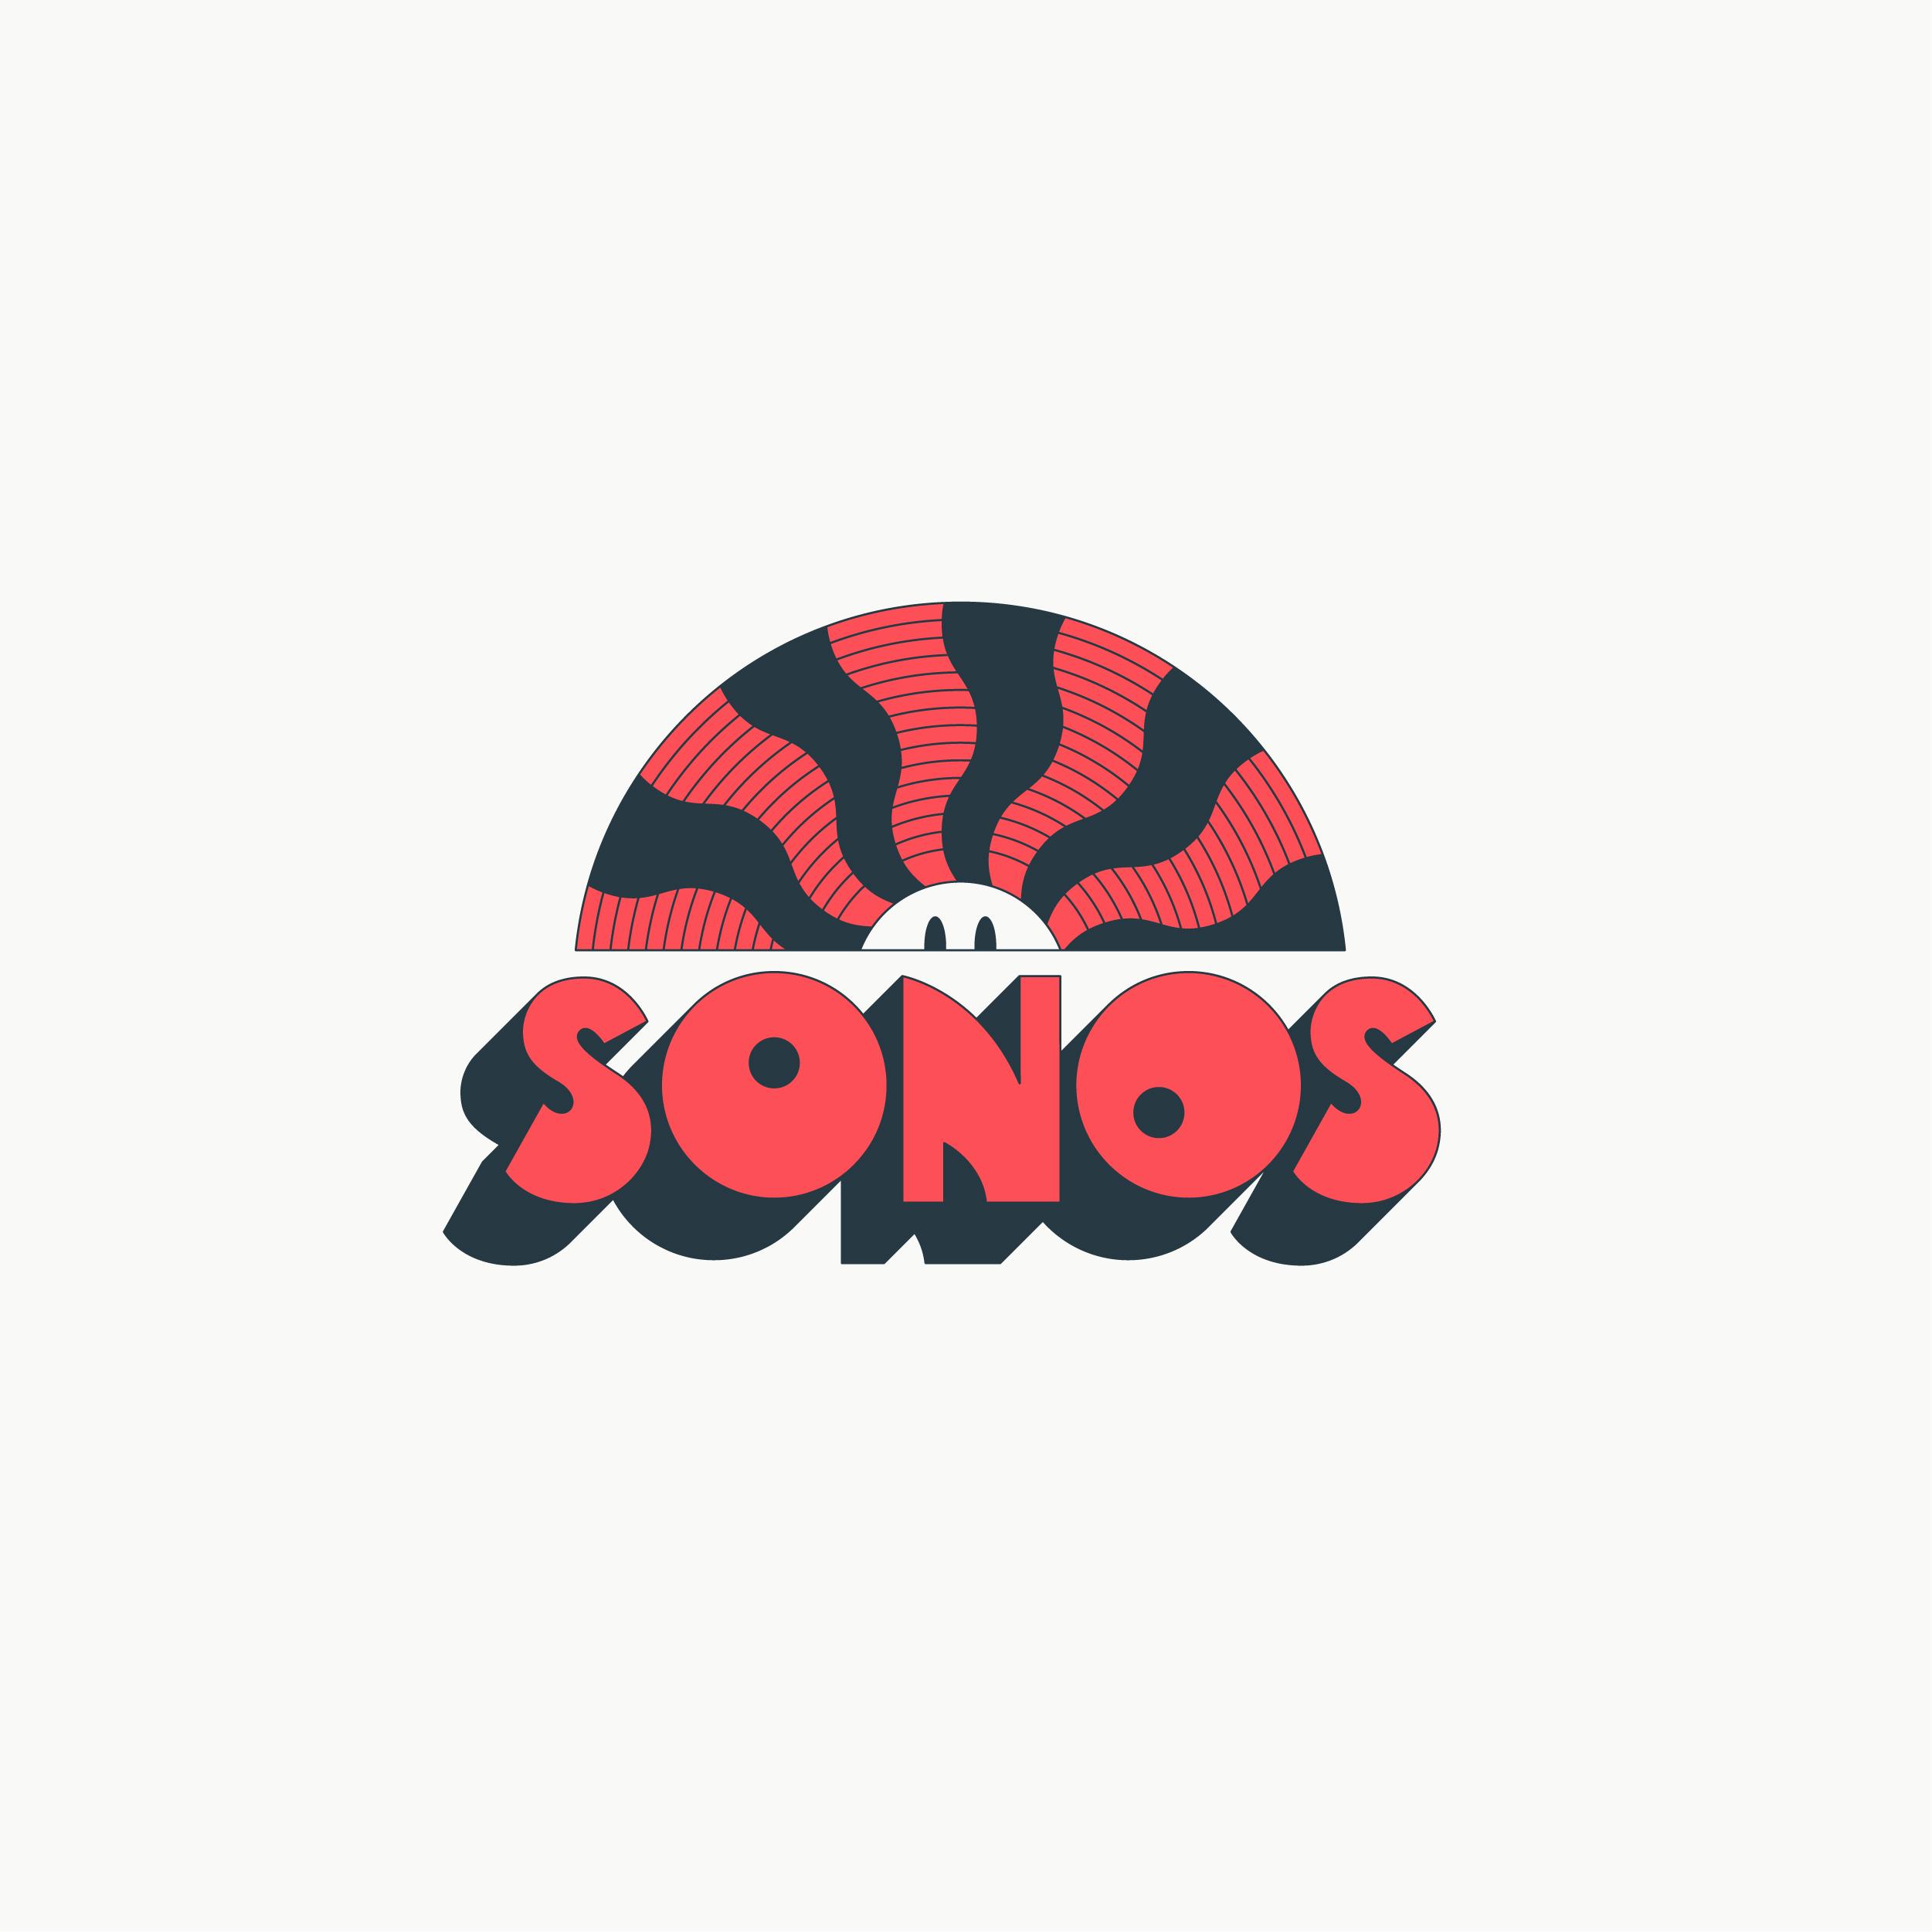 TBS_LogosMarks_Sonos